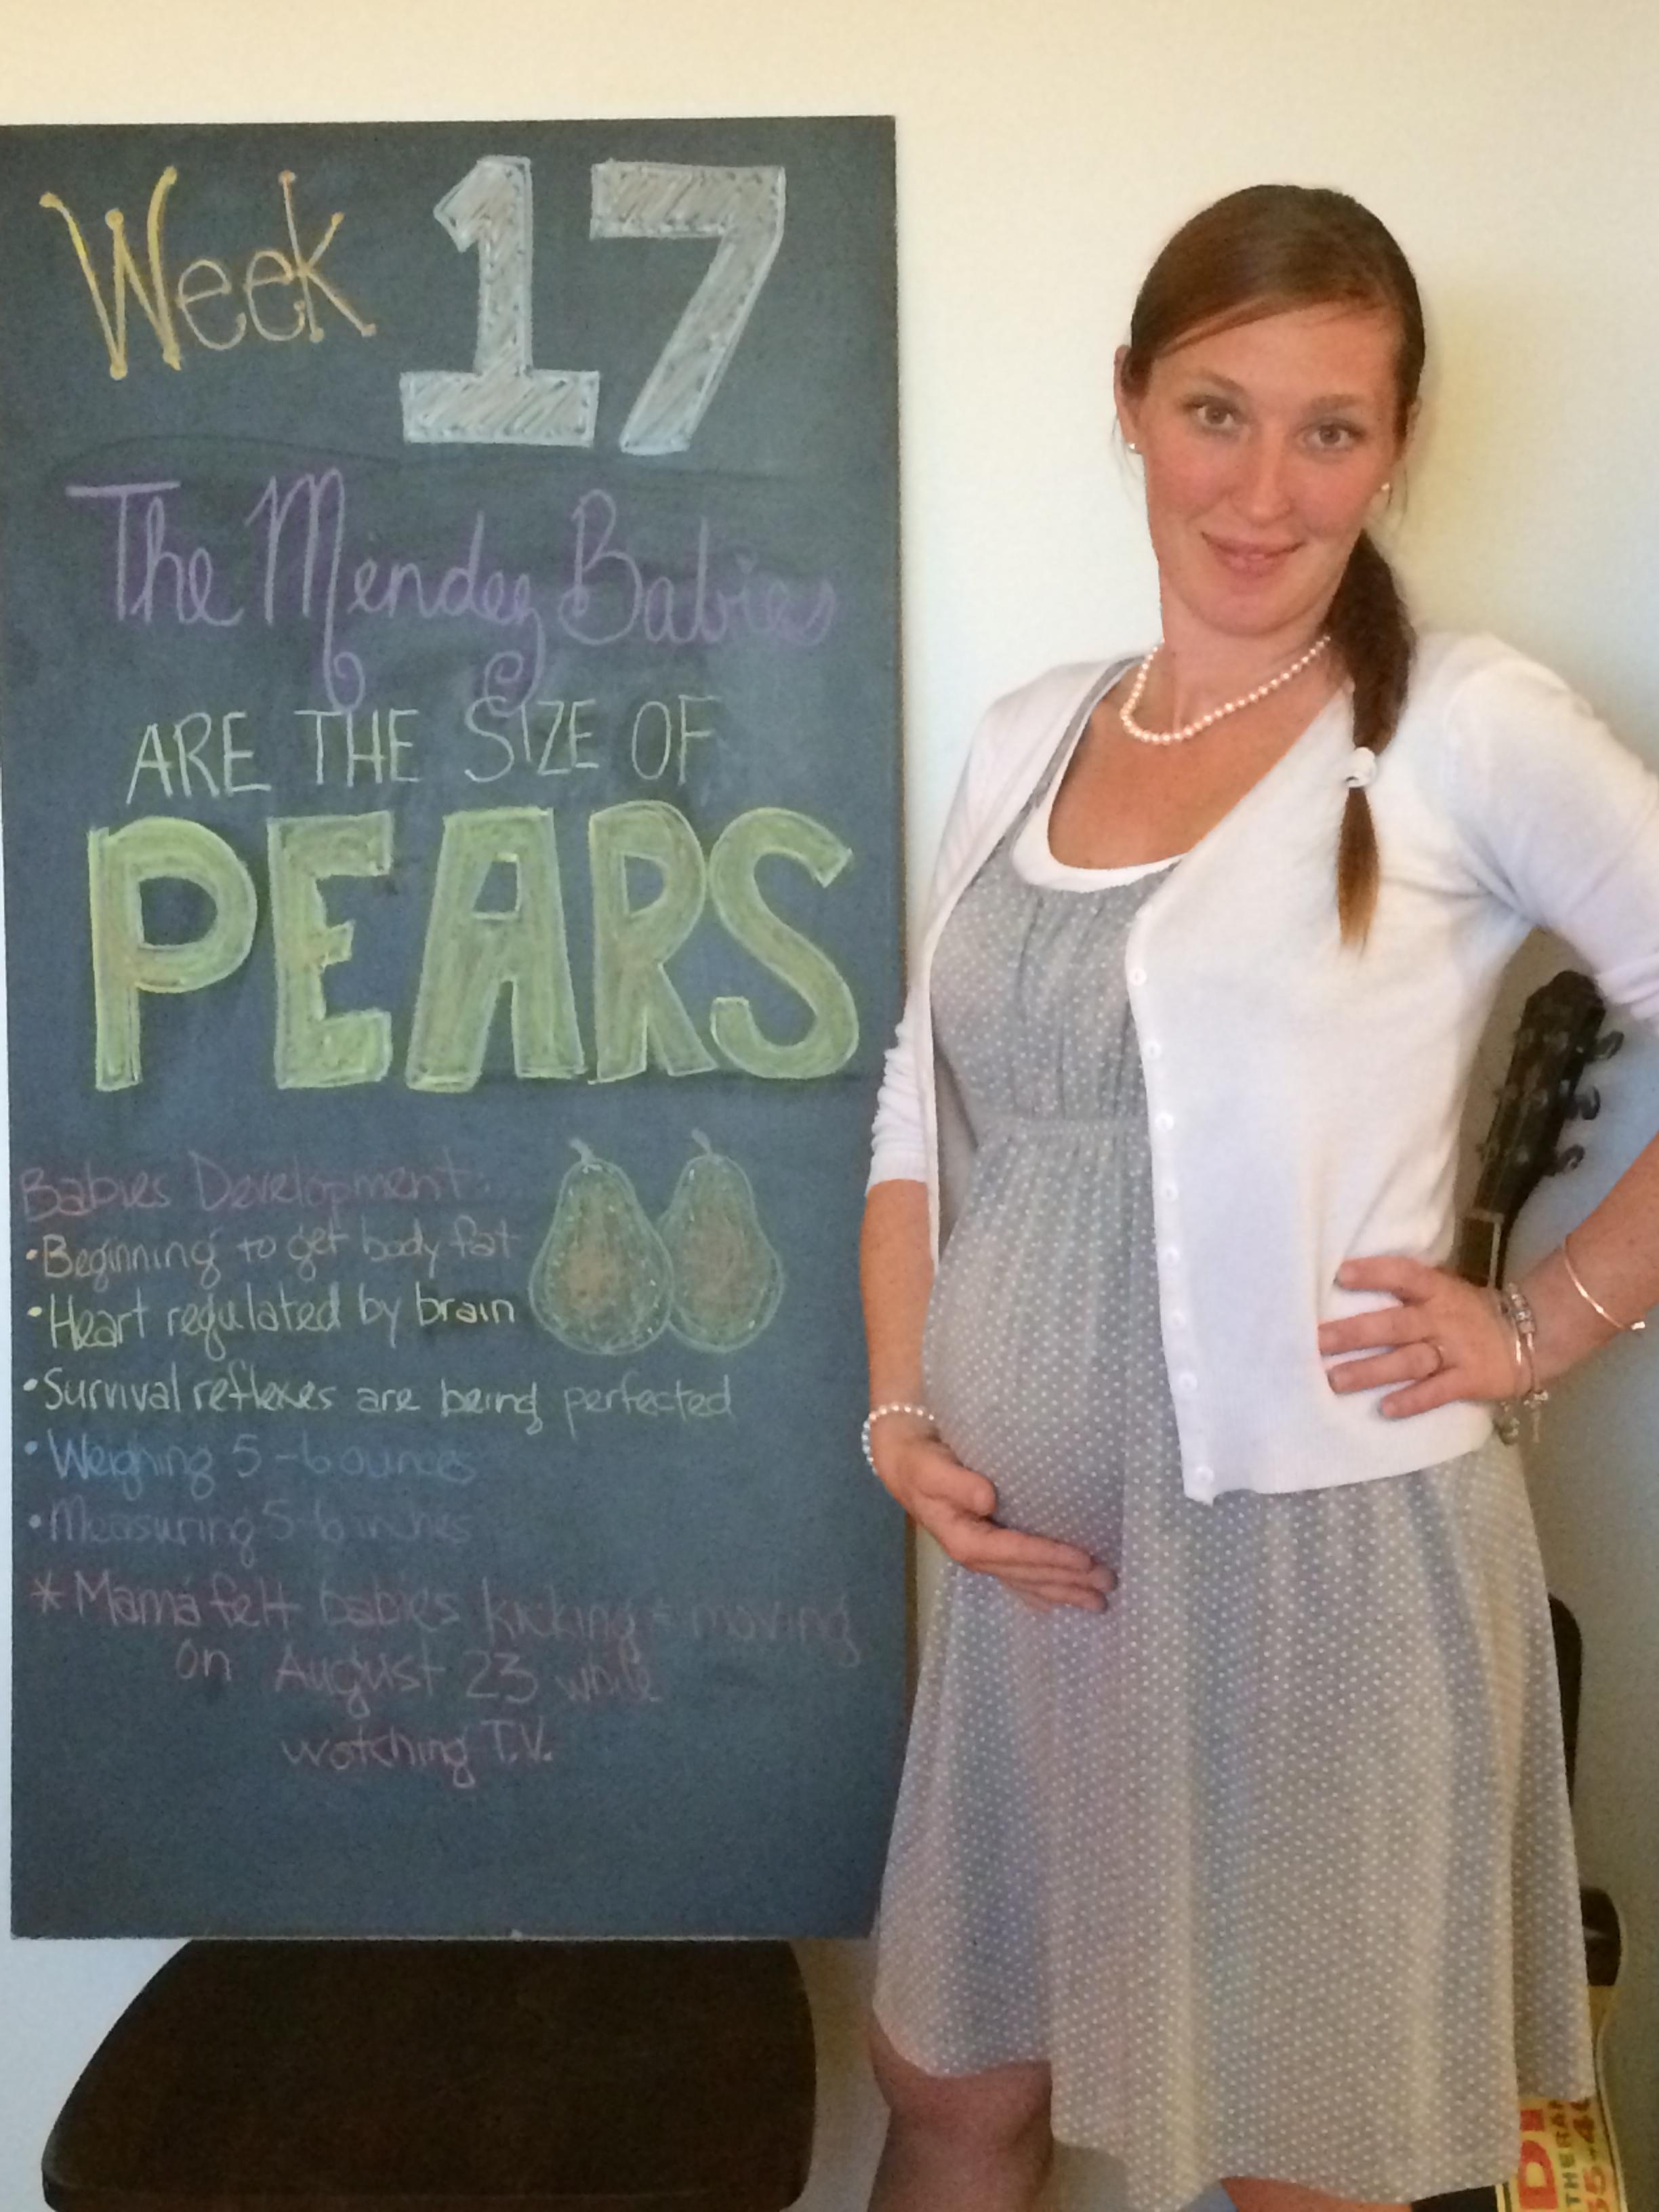 Fullsize Of Pregnant At 17